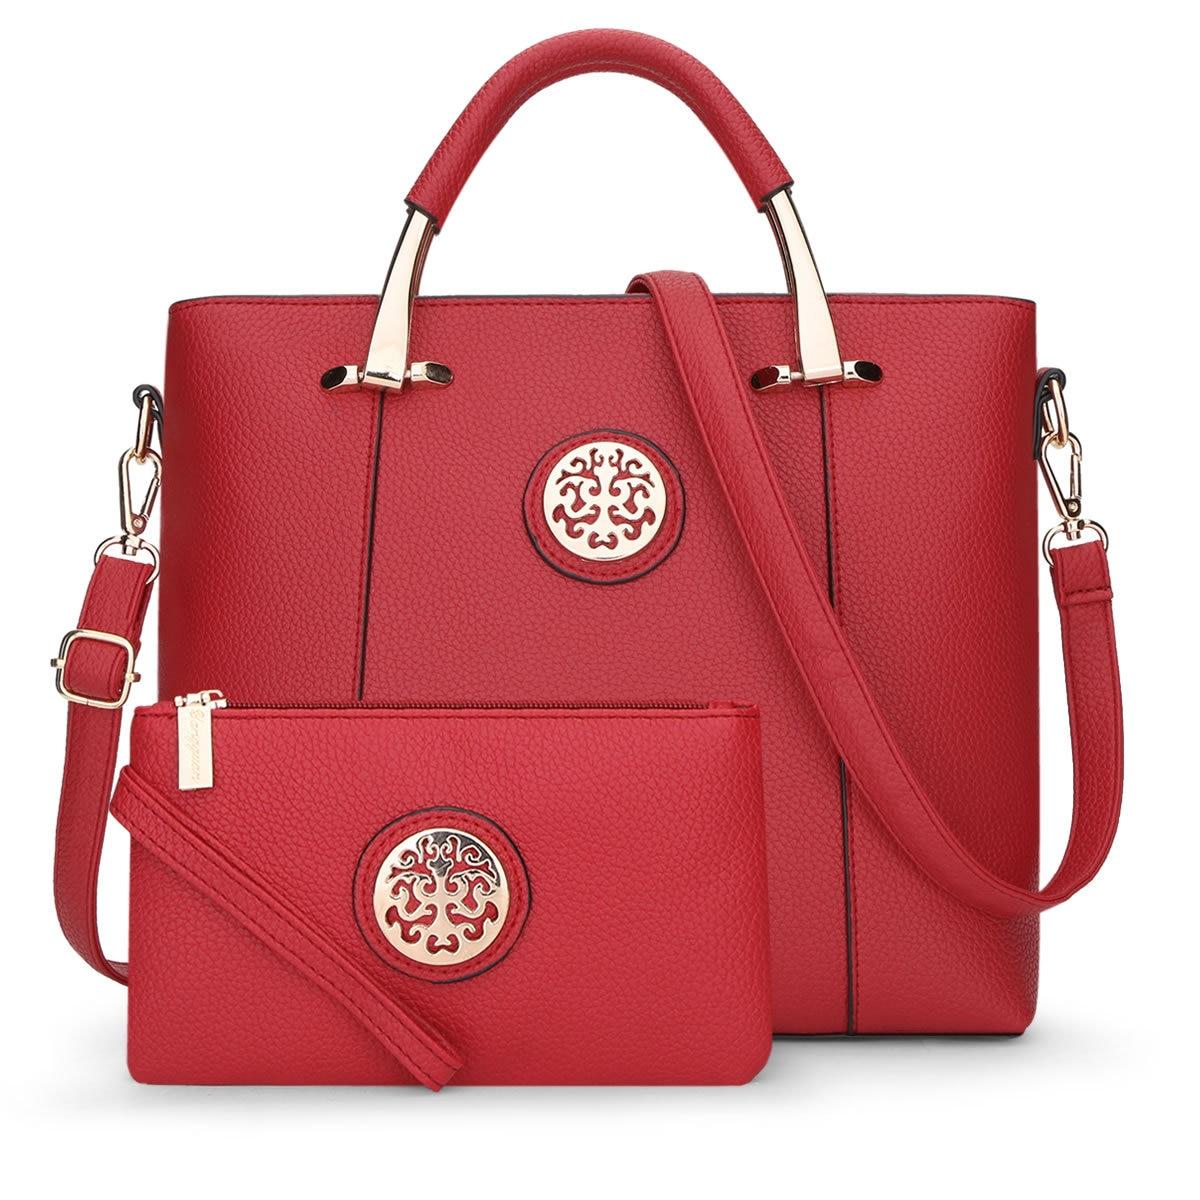 f4a130c775d8 2017 Luxury Women Leather Handbags Set Designer Handbag High Quality Big  Shoulder Bag Famous Brand Tote Ladies Hand Bags